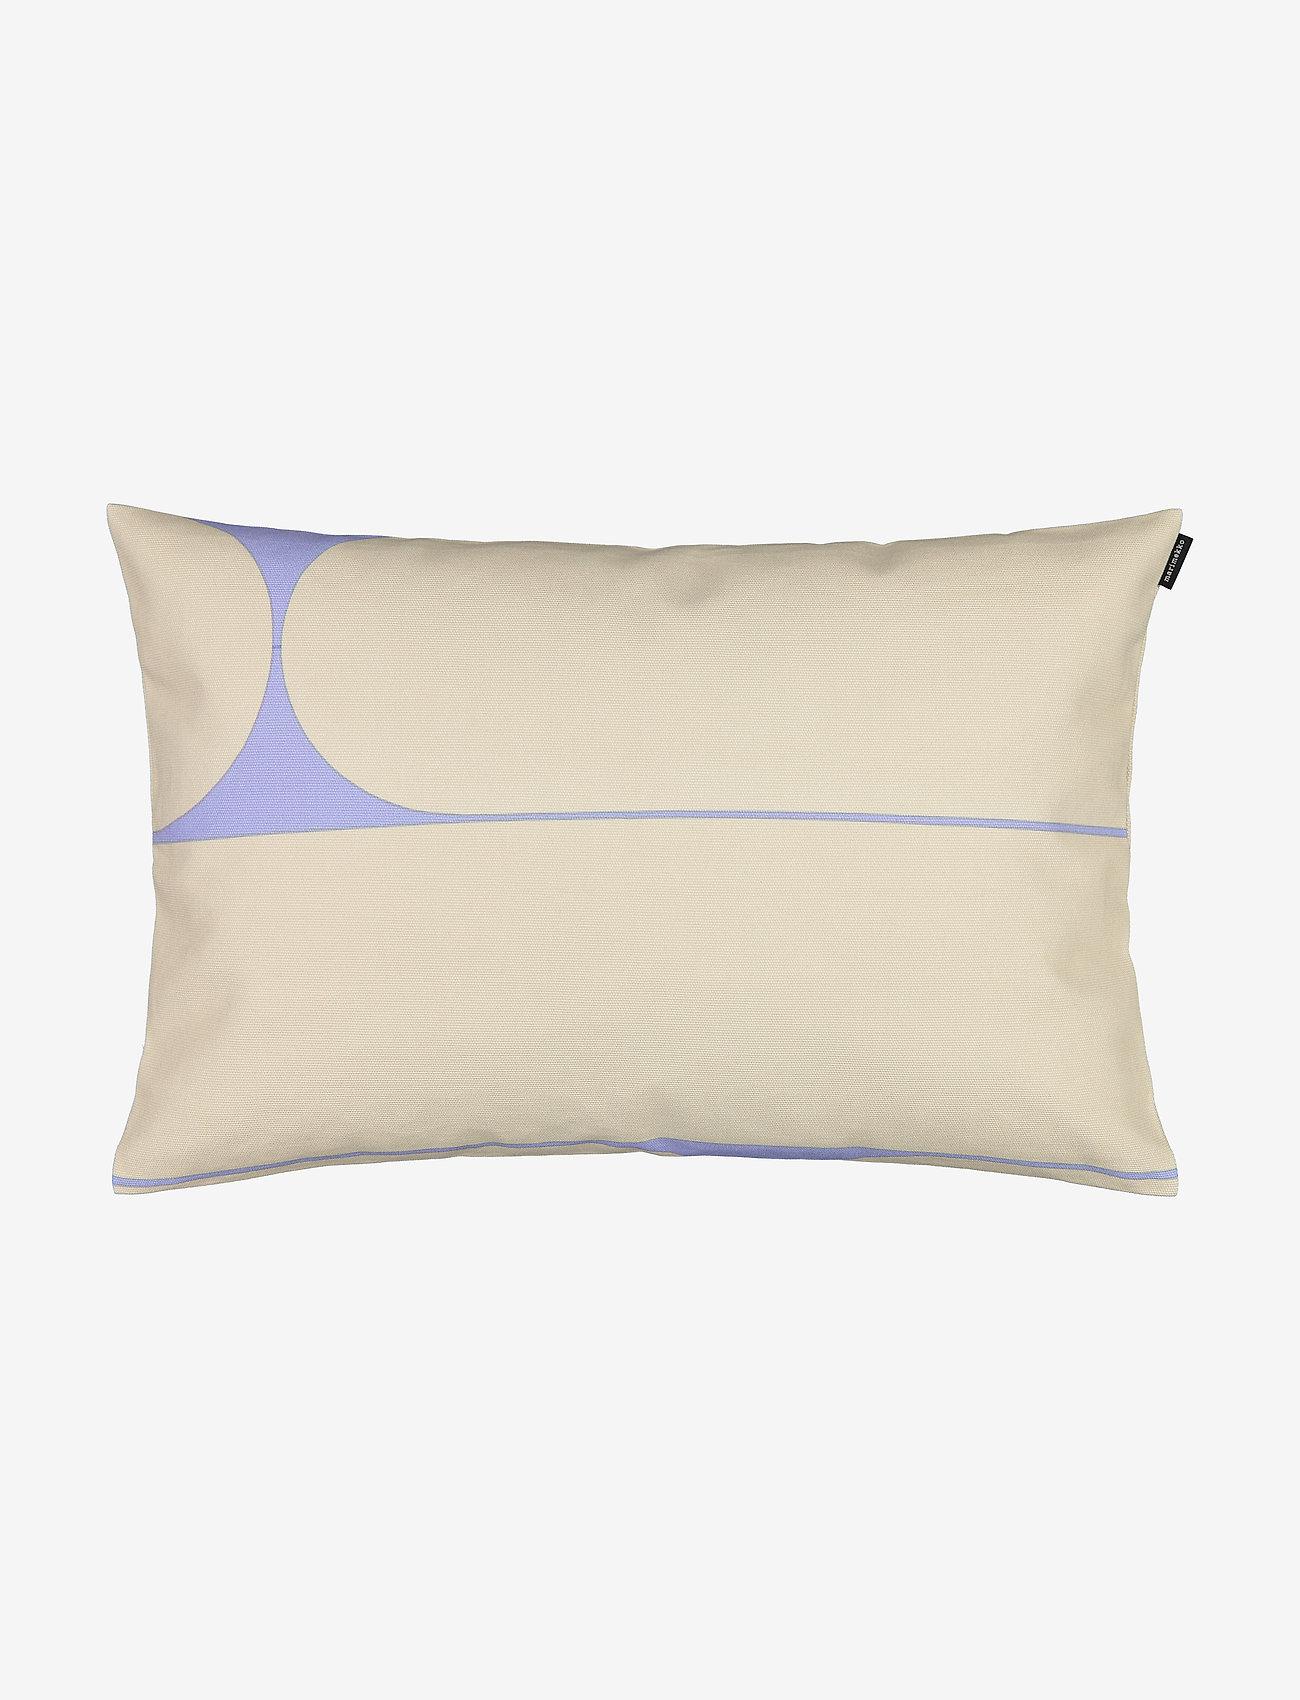 Marimekko Home - PUTKI CUSHION COVER - coussins - beige, blue - 0